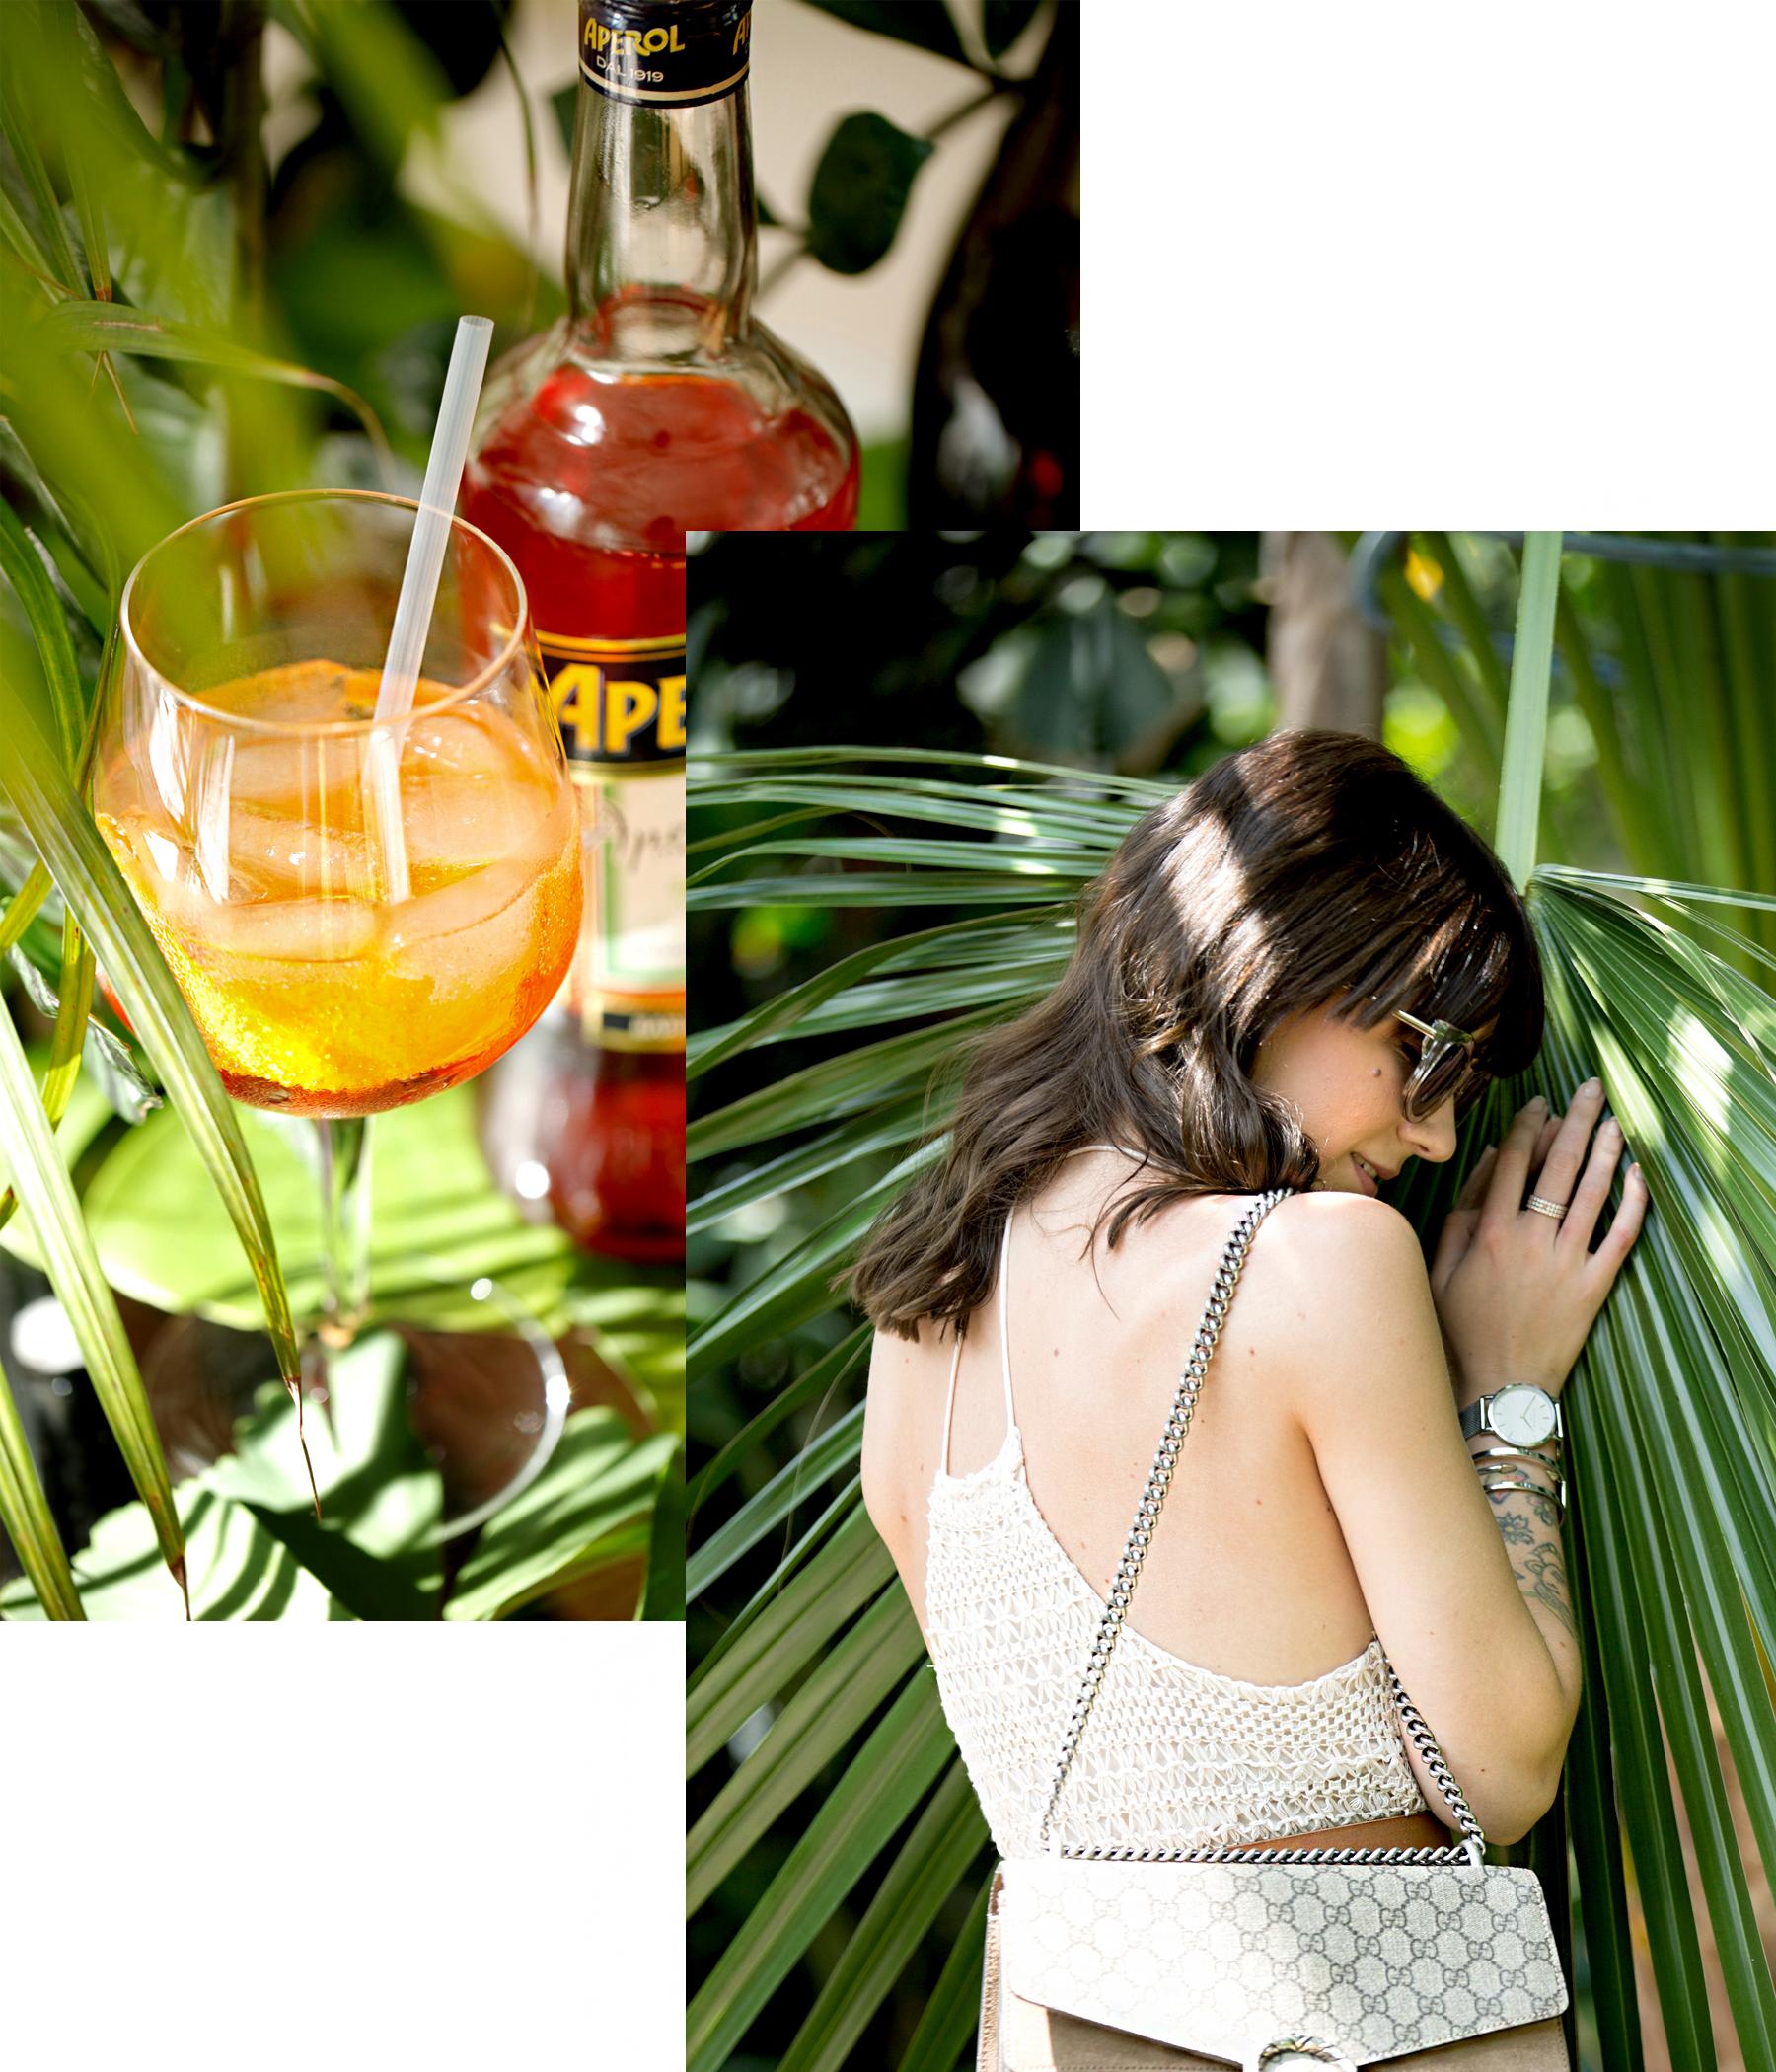 aperol spritz summer aperitif drink cocktail recipe personal urban jungle garden palm tree holiday feeling white crochet dress hm gucci belt saint laurent wedges dionysus ricarda schernus fashionblogger 6